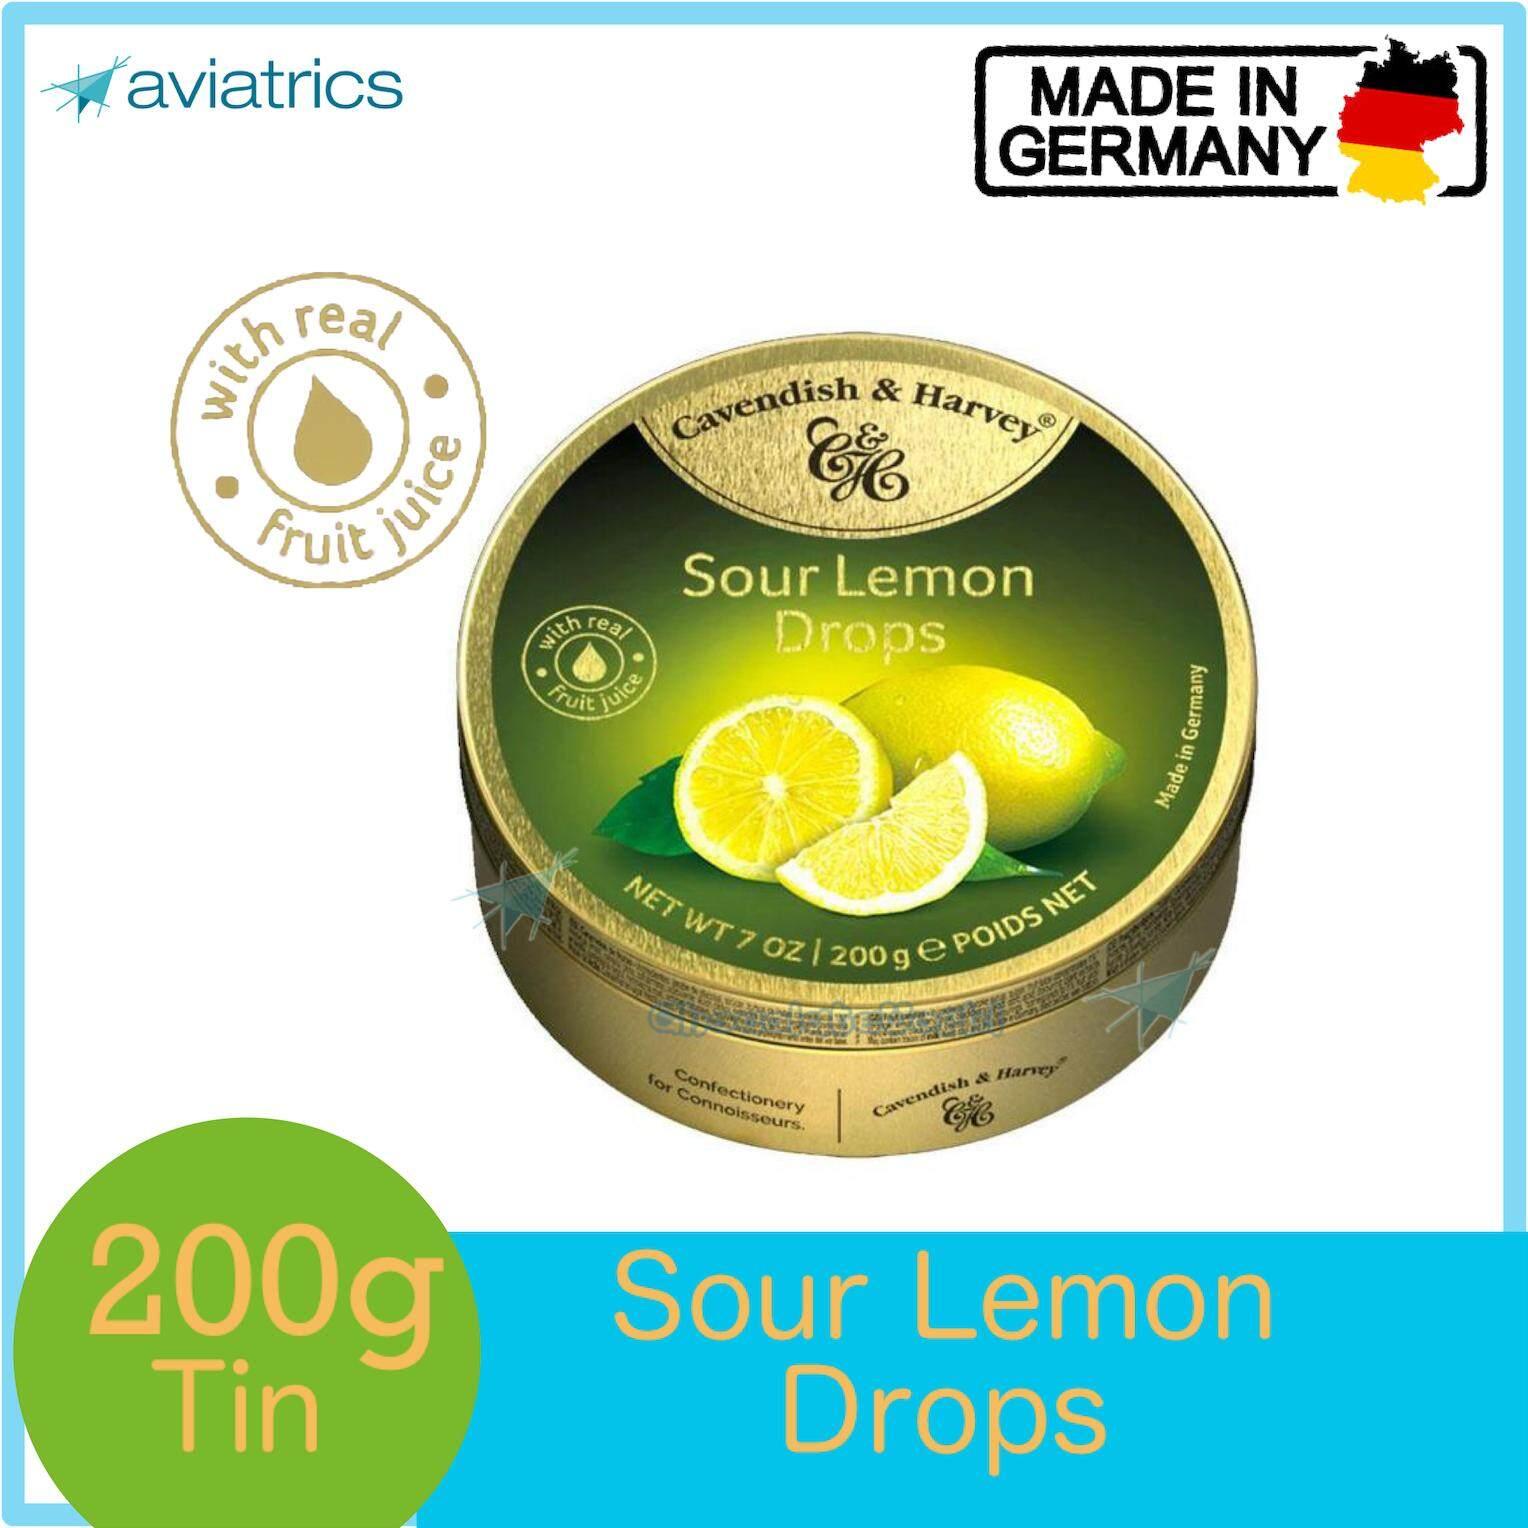 Cavendish Harvey Sour Lemon Drops 200g (Made in Germany)